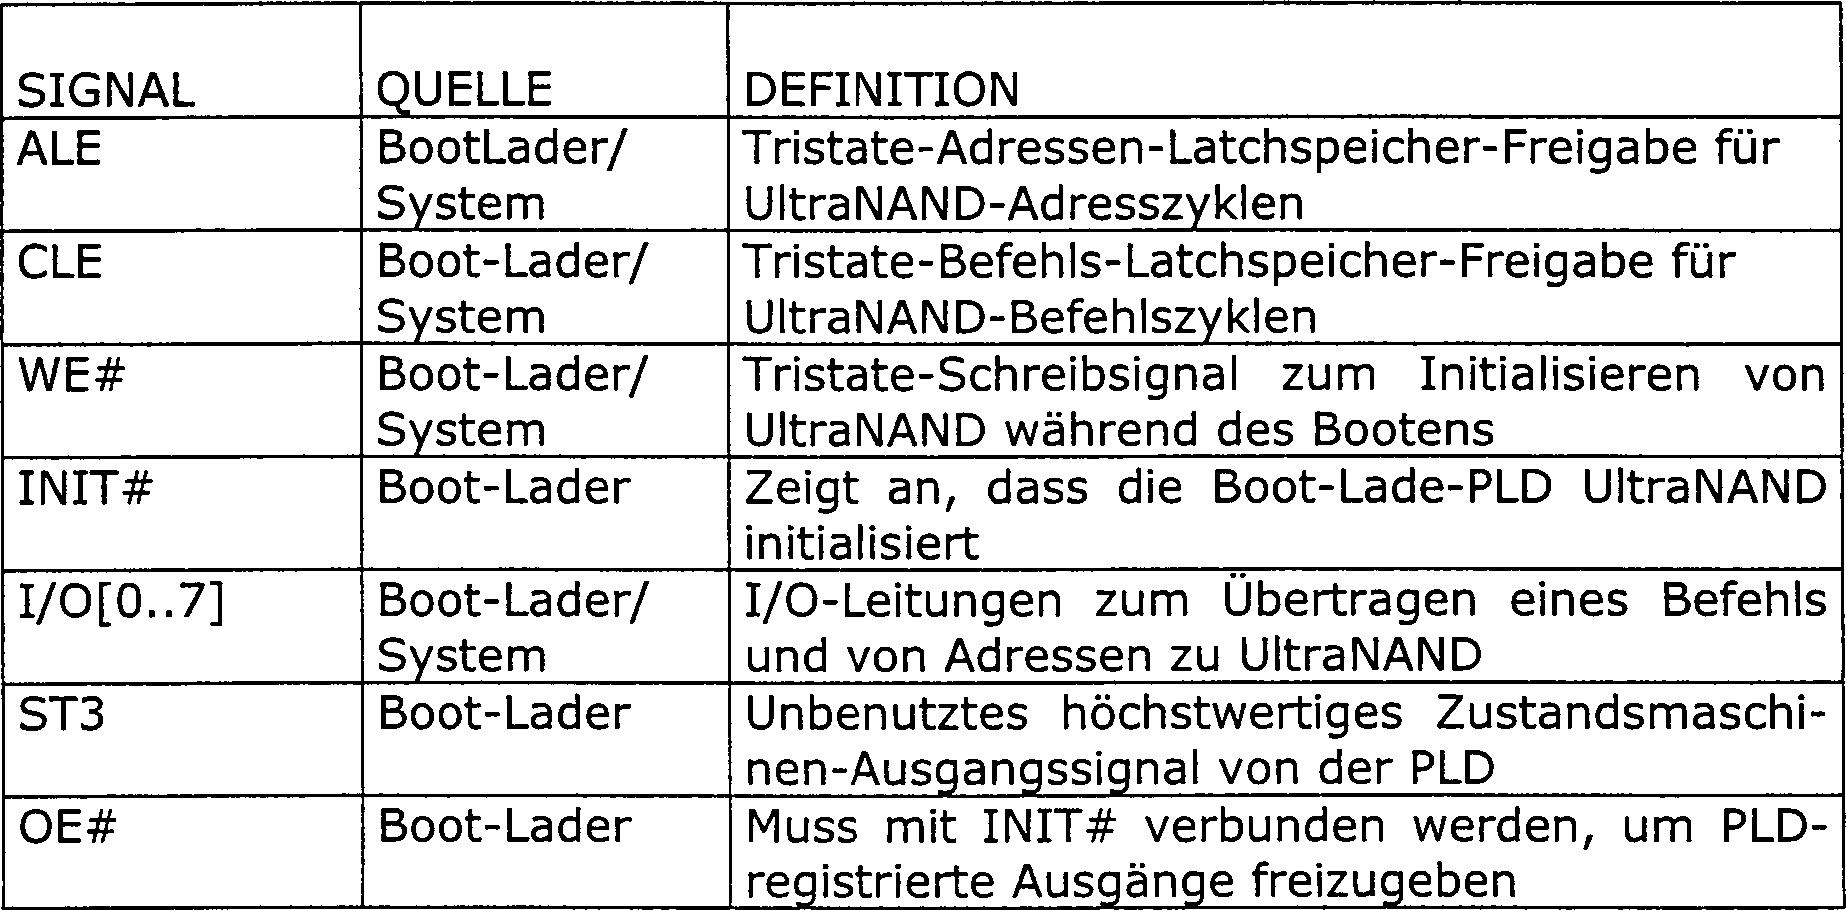 DE60005563T2 - Rechnersysteminitialisierung by data stored